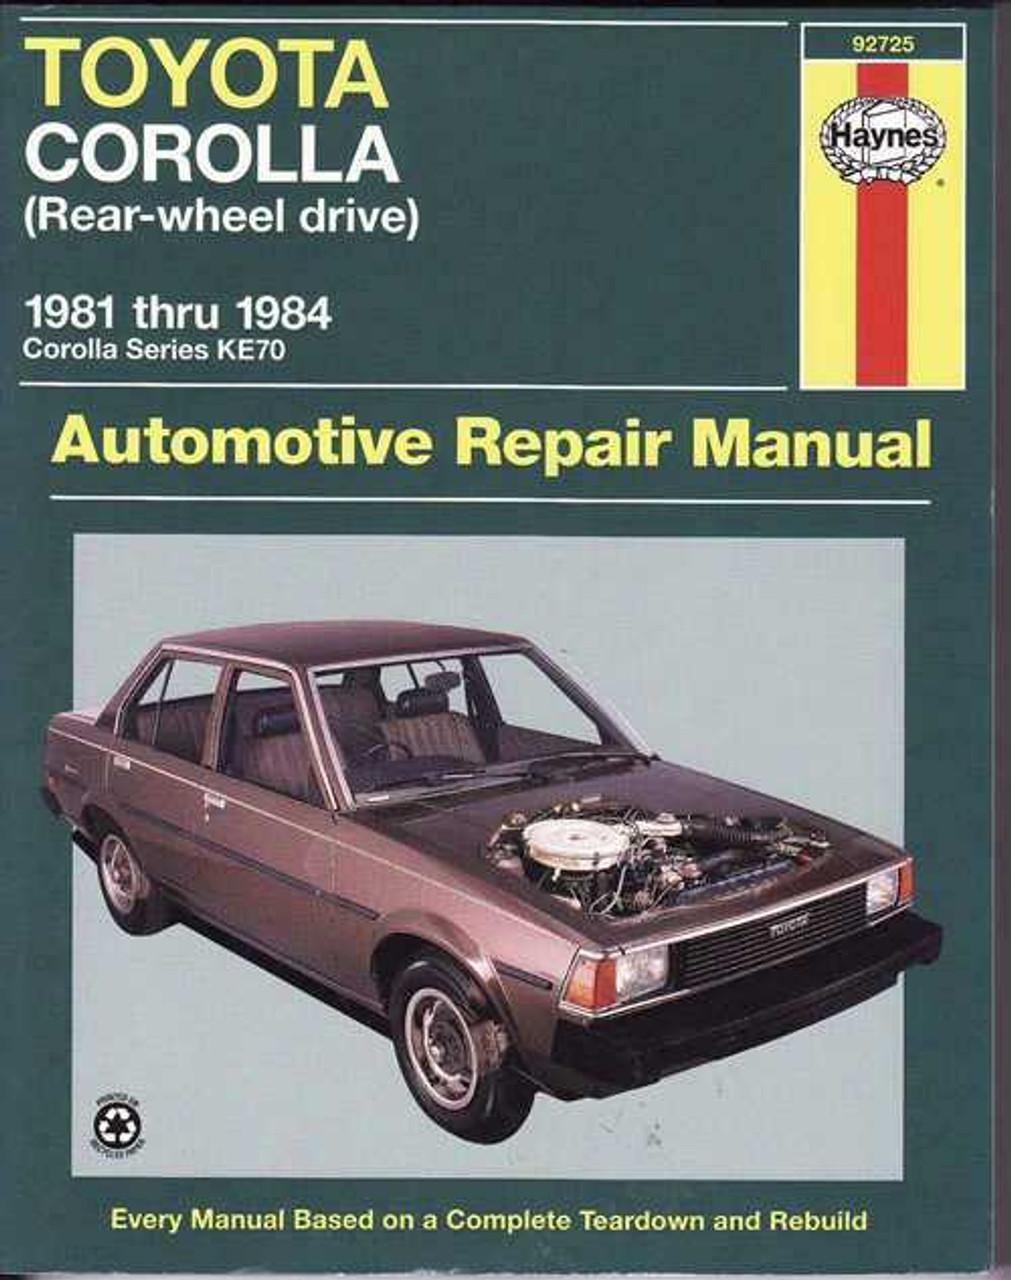 1986 toyota corolla workshop manual best setting instruction guide u2022 rh ourk9 co Collora Hybrid Thomas Collora